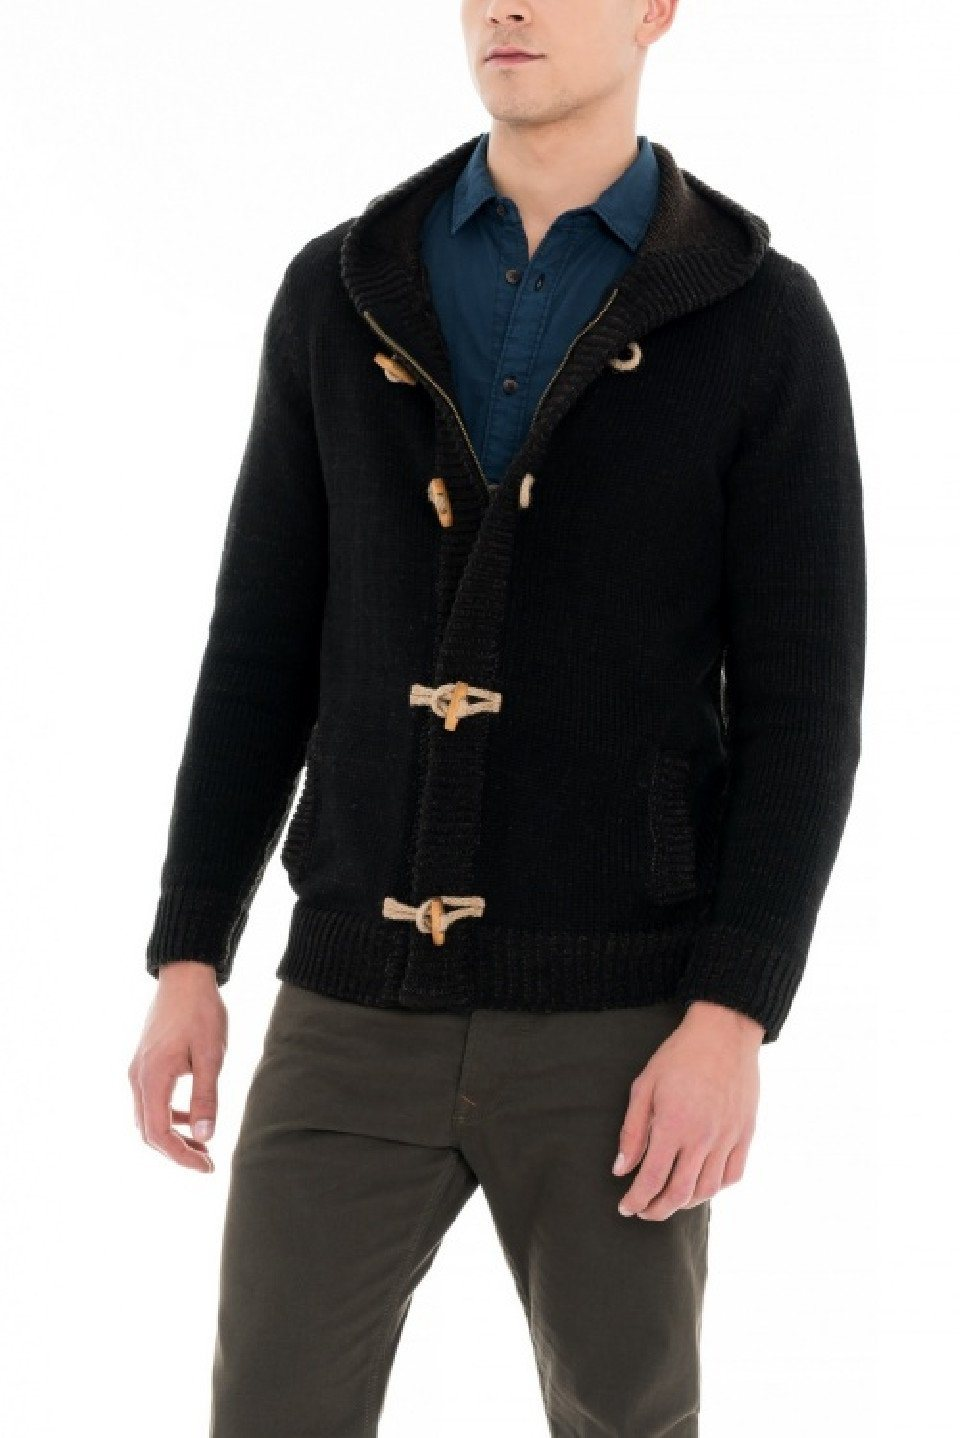 Herren salsa jeans Strickjacke CAMBRIDGE blau, braun, schwarz   05604562814539